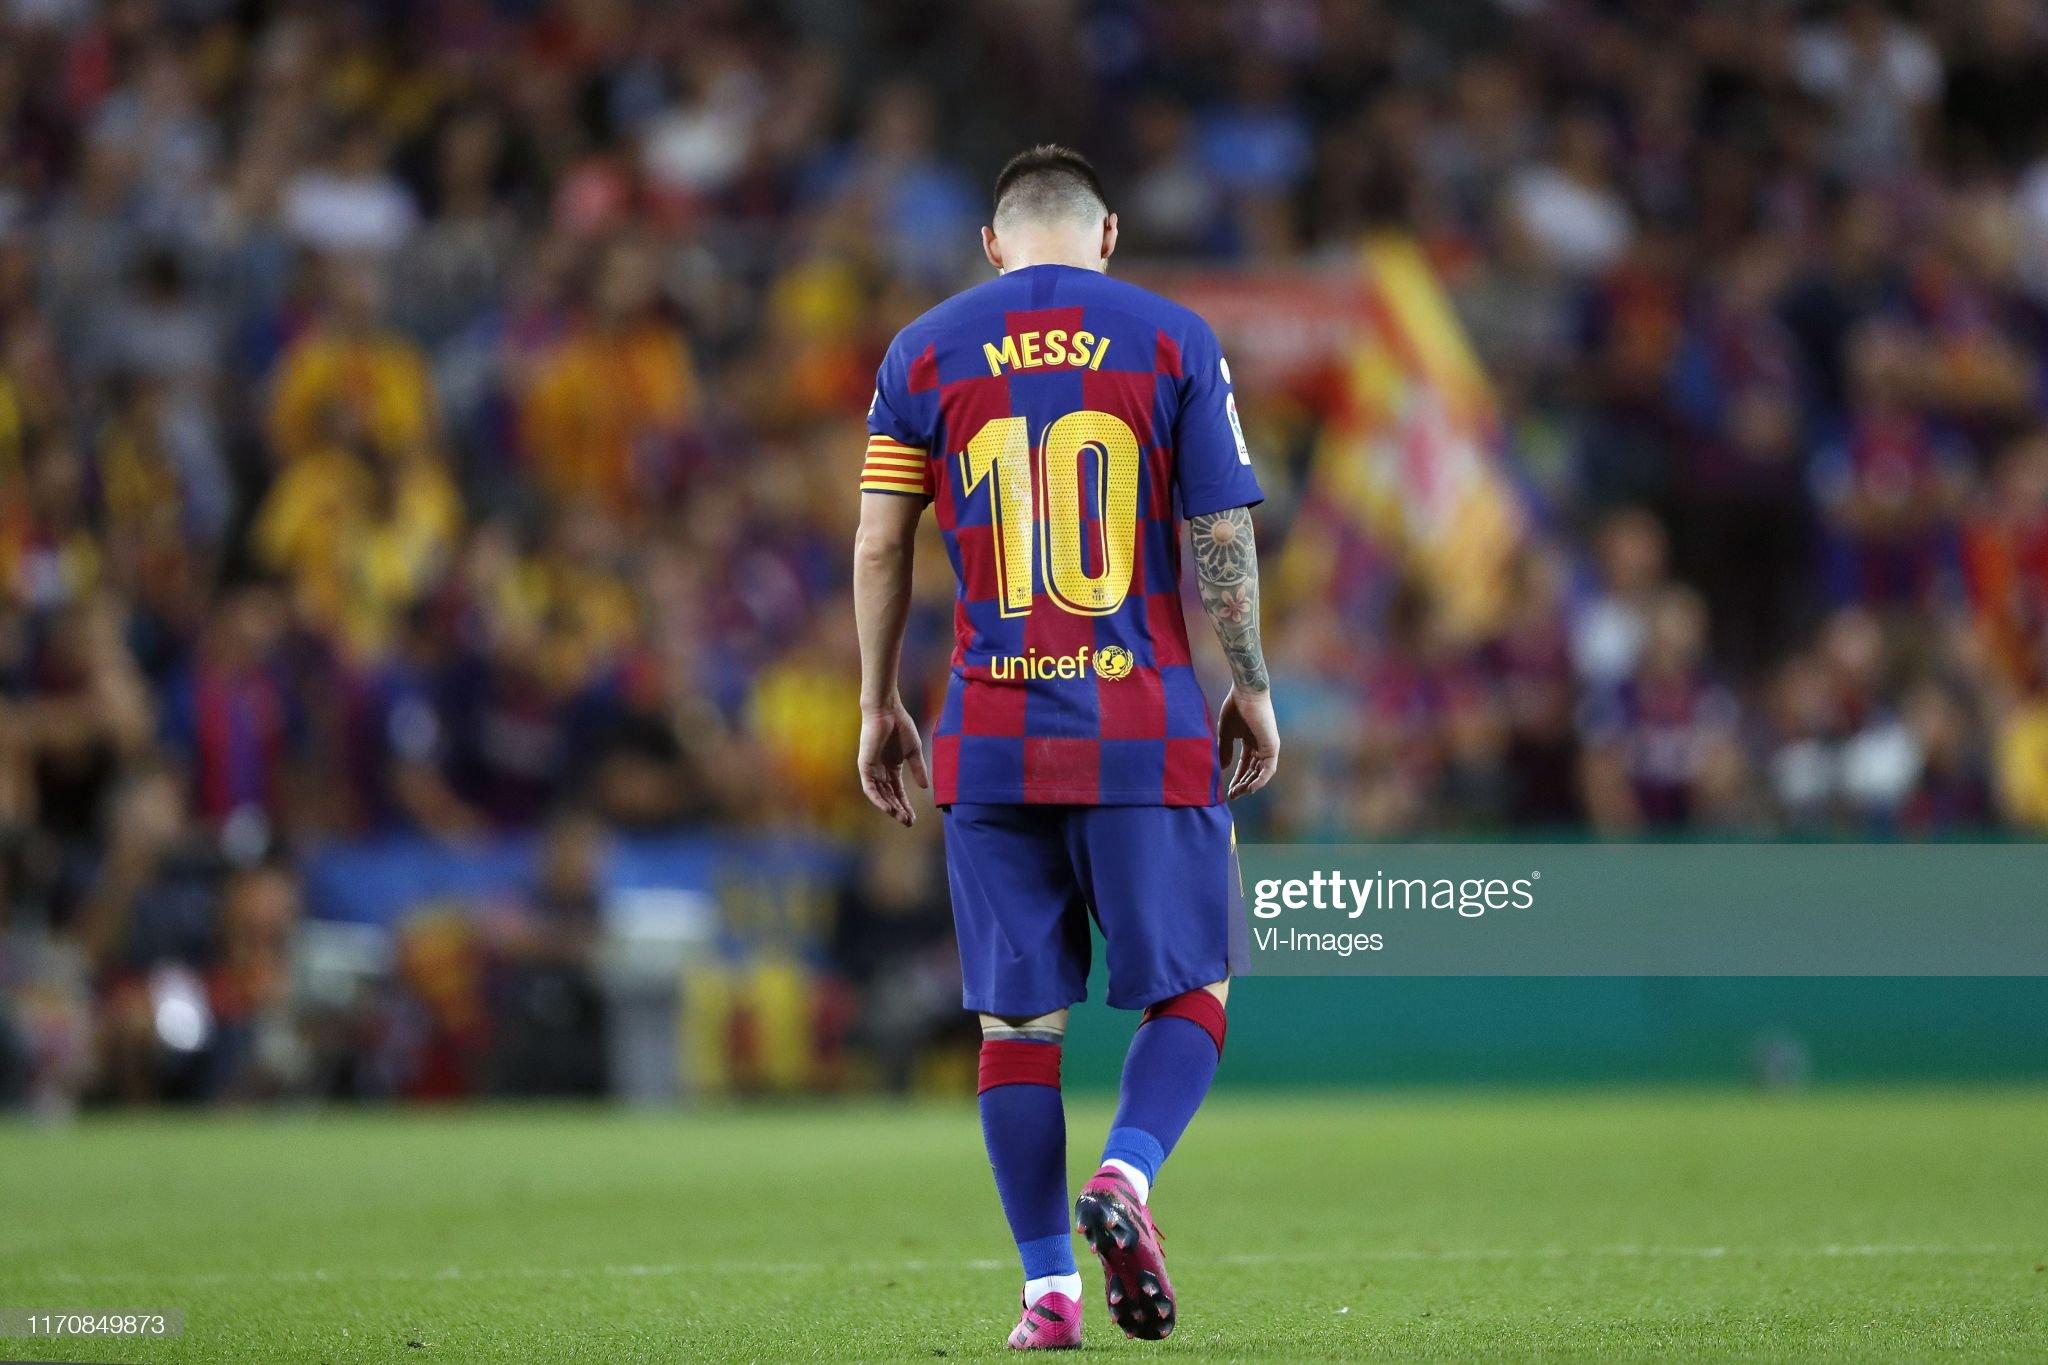 صور مباراة : برشلونة - فياريال 2-1 ( 24-09-2019 )  Lionel-messi-of-fc-barcelona-during-the-laliga-santander-match-fc-picture-id1170849873?s=2048x2048